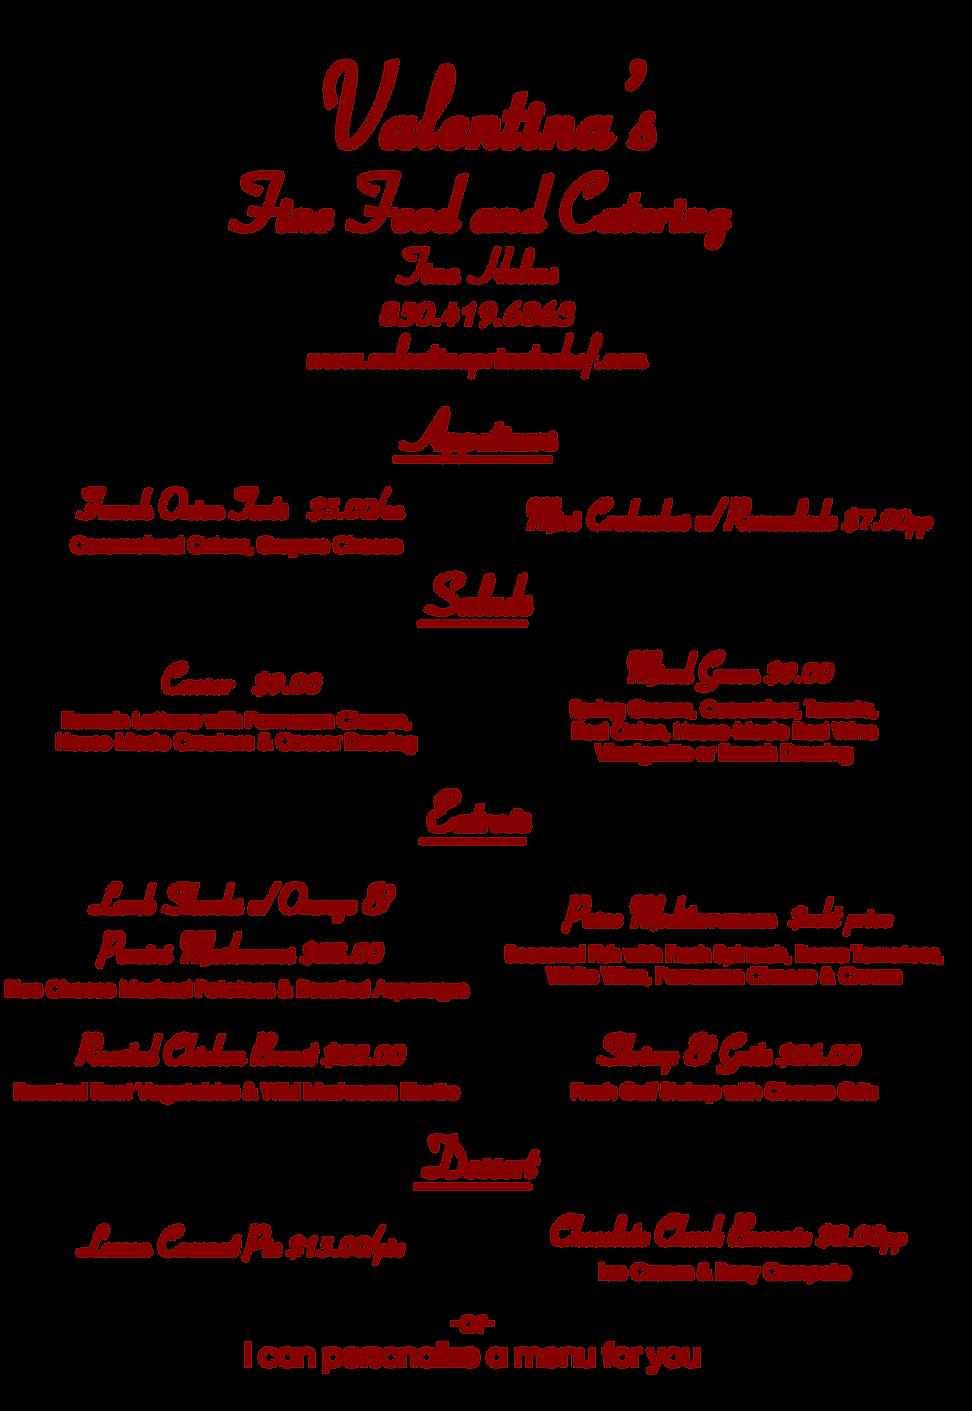 Valentina menu 3-20.png